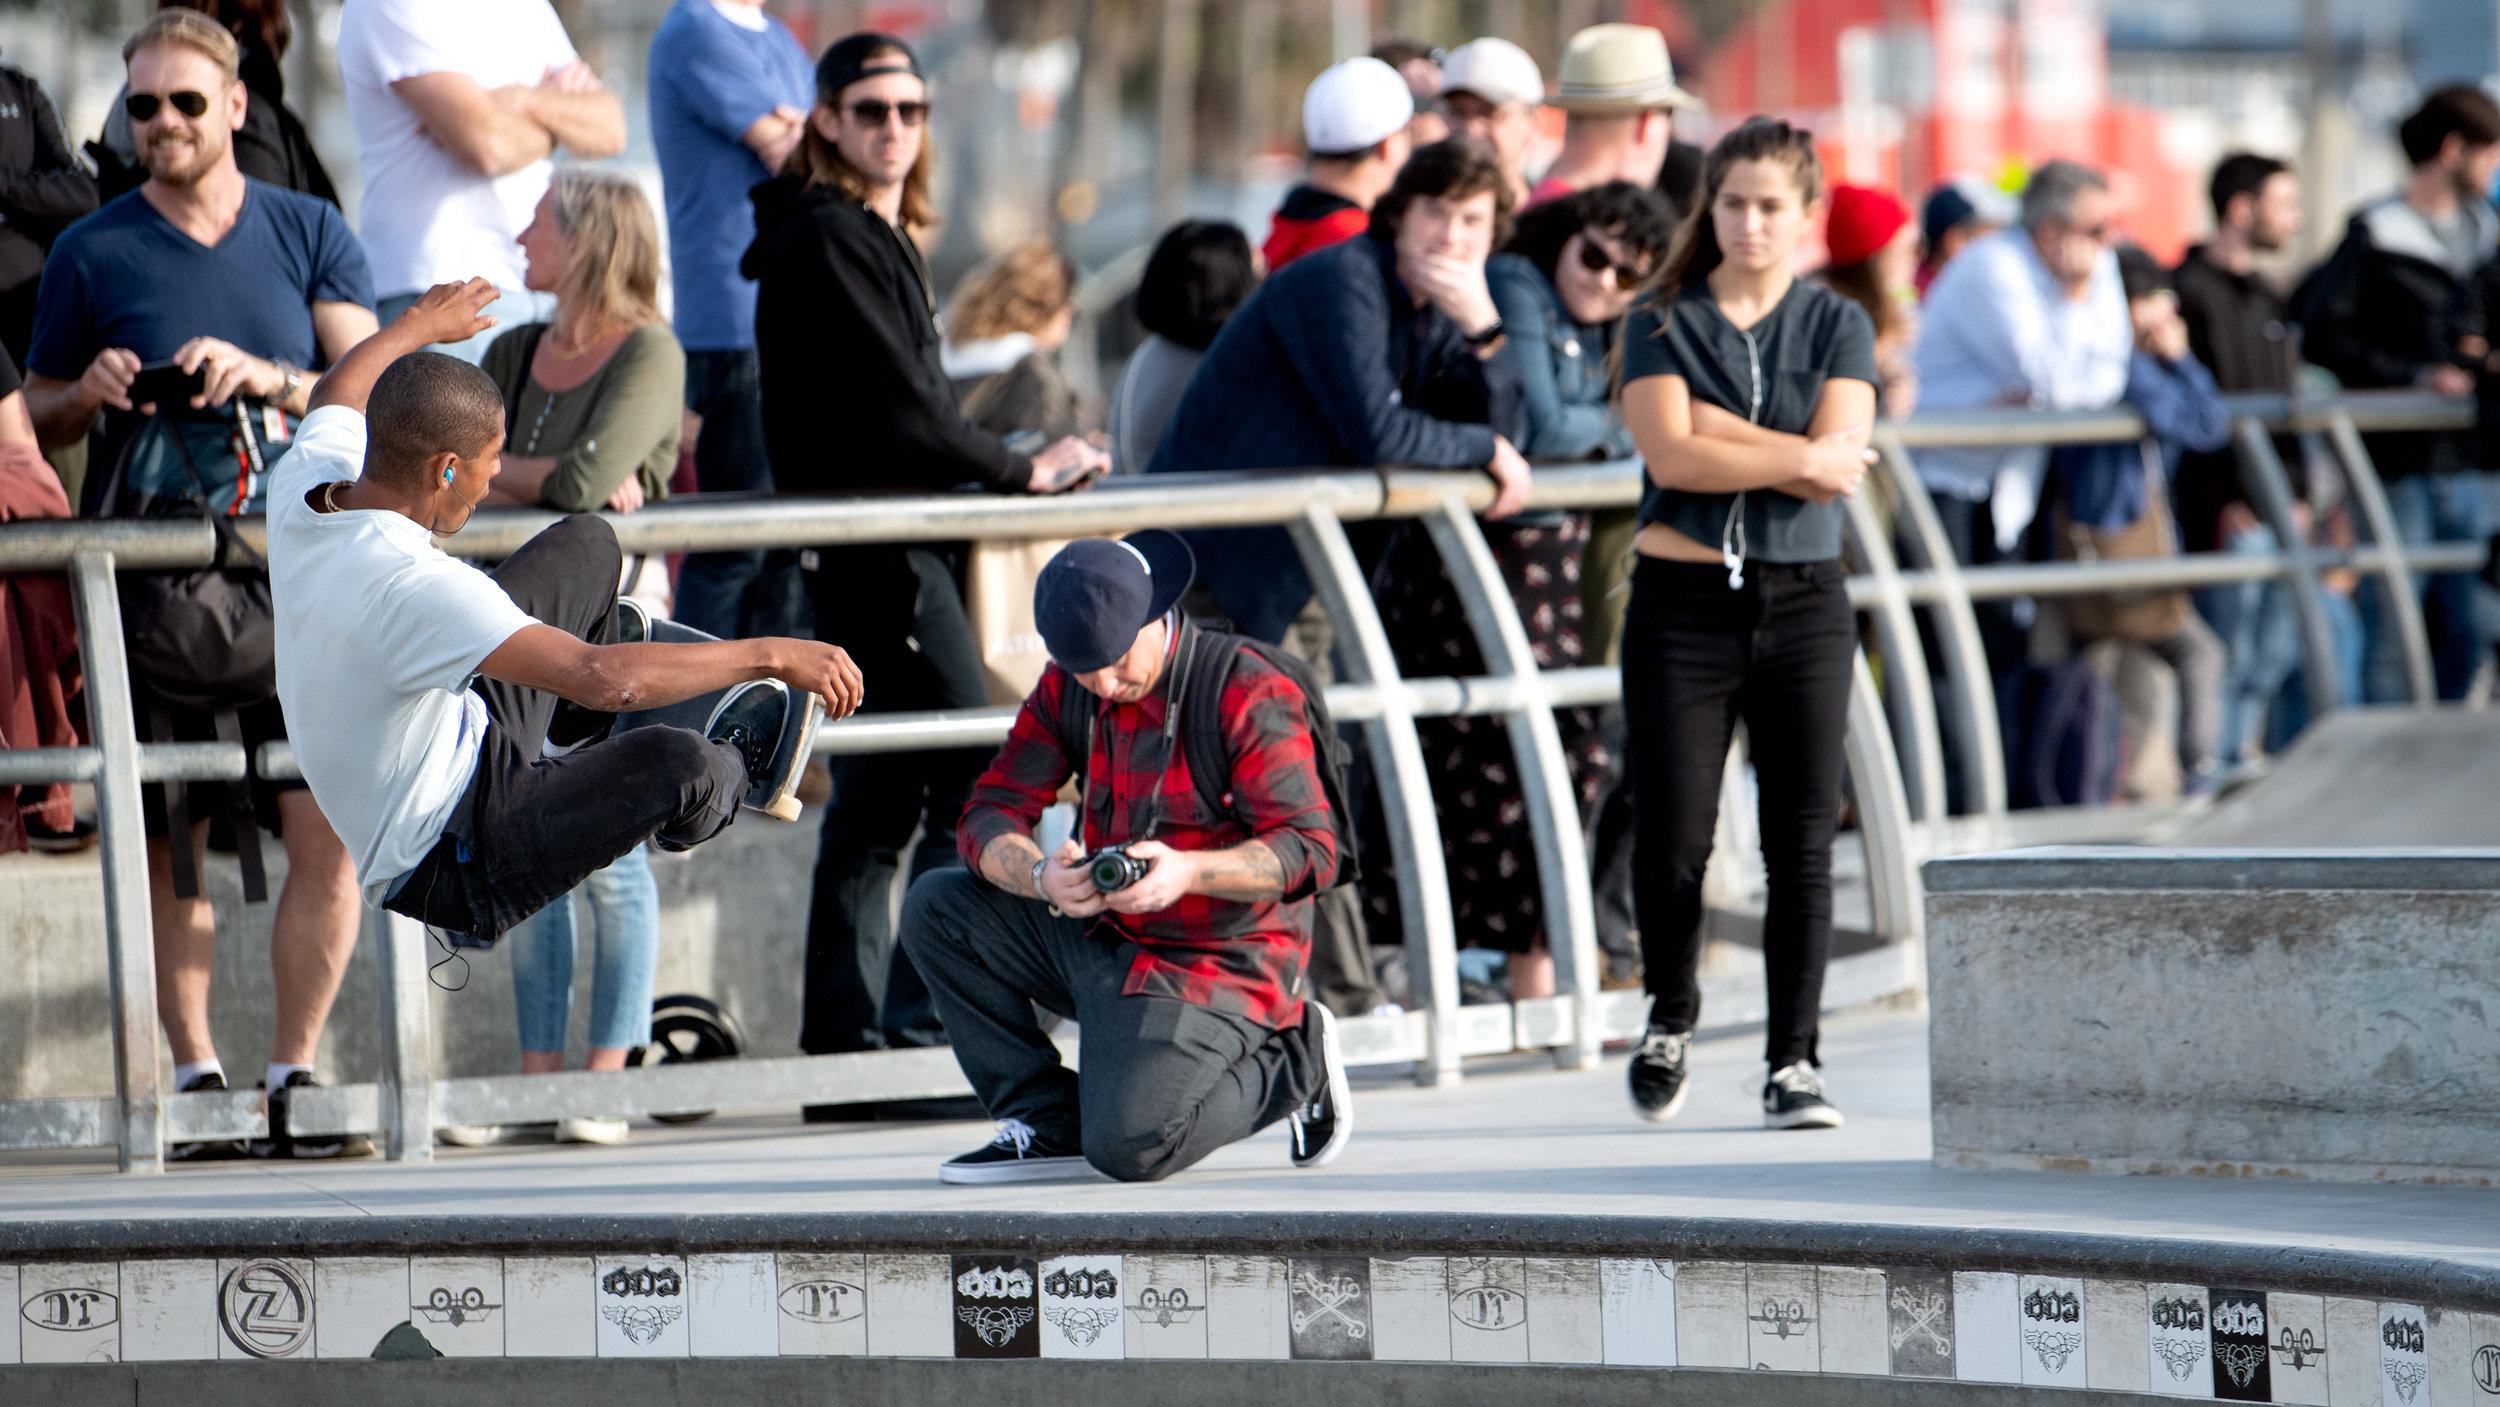 Venice Beach Skateboarders-18.jpg